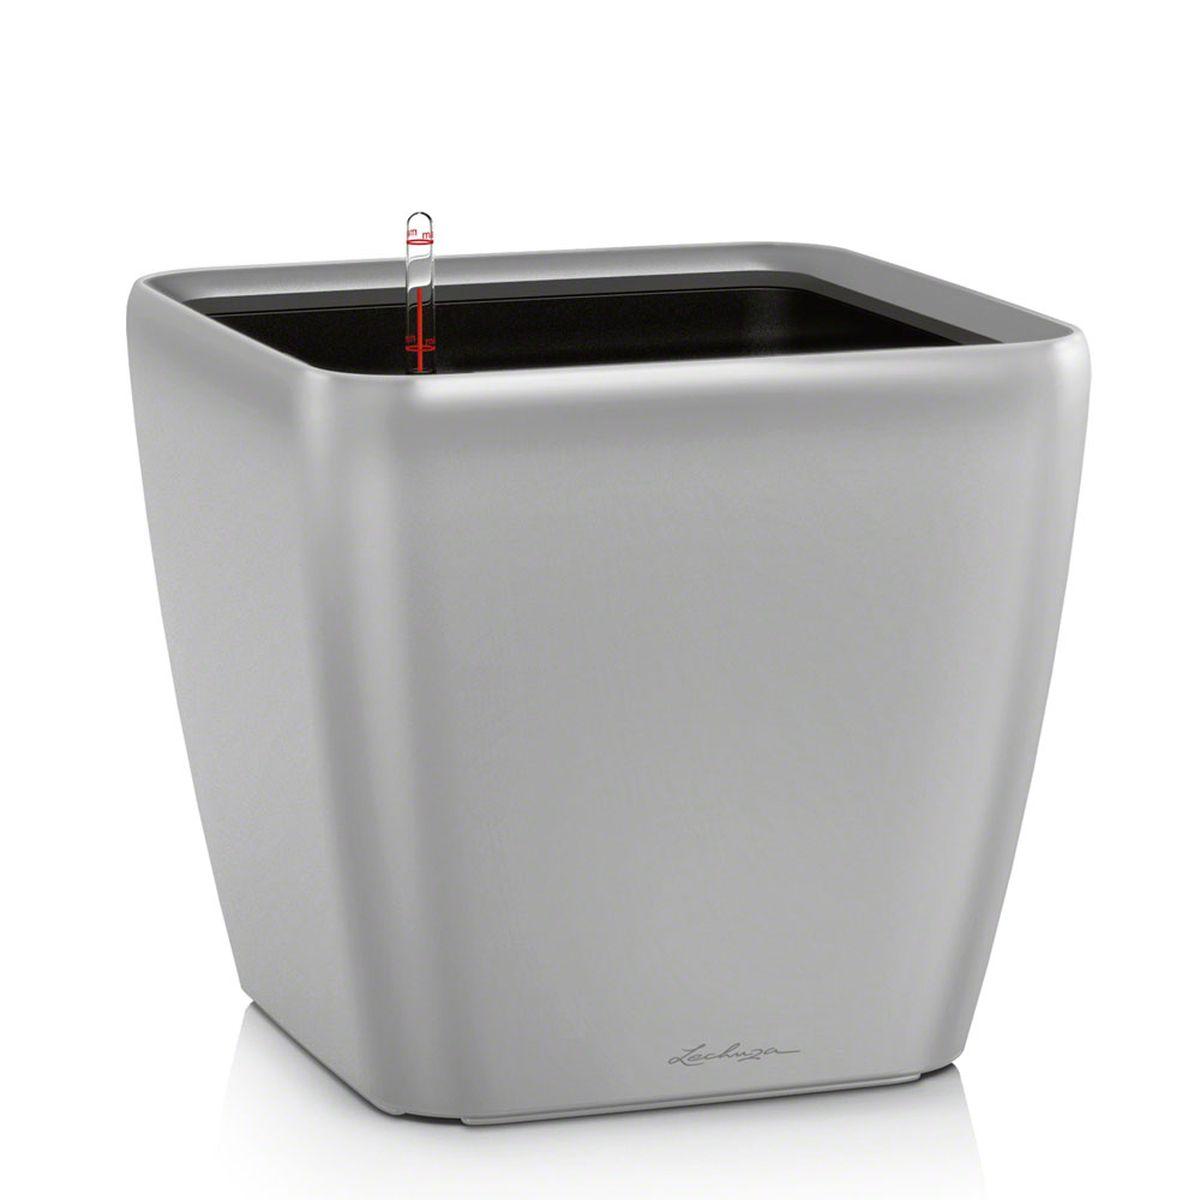 Кашпо Lechuza Quadro, с системой автополива, цвет: серебристый, 50 х 50 х 47 см quadro сумки